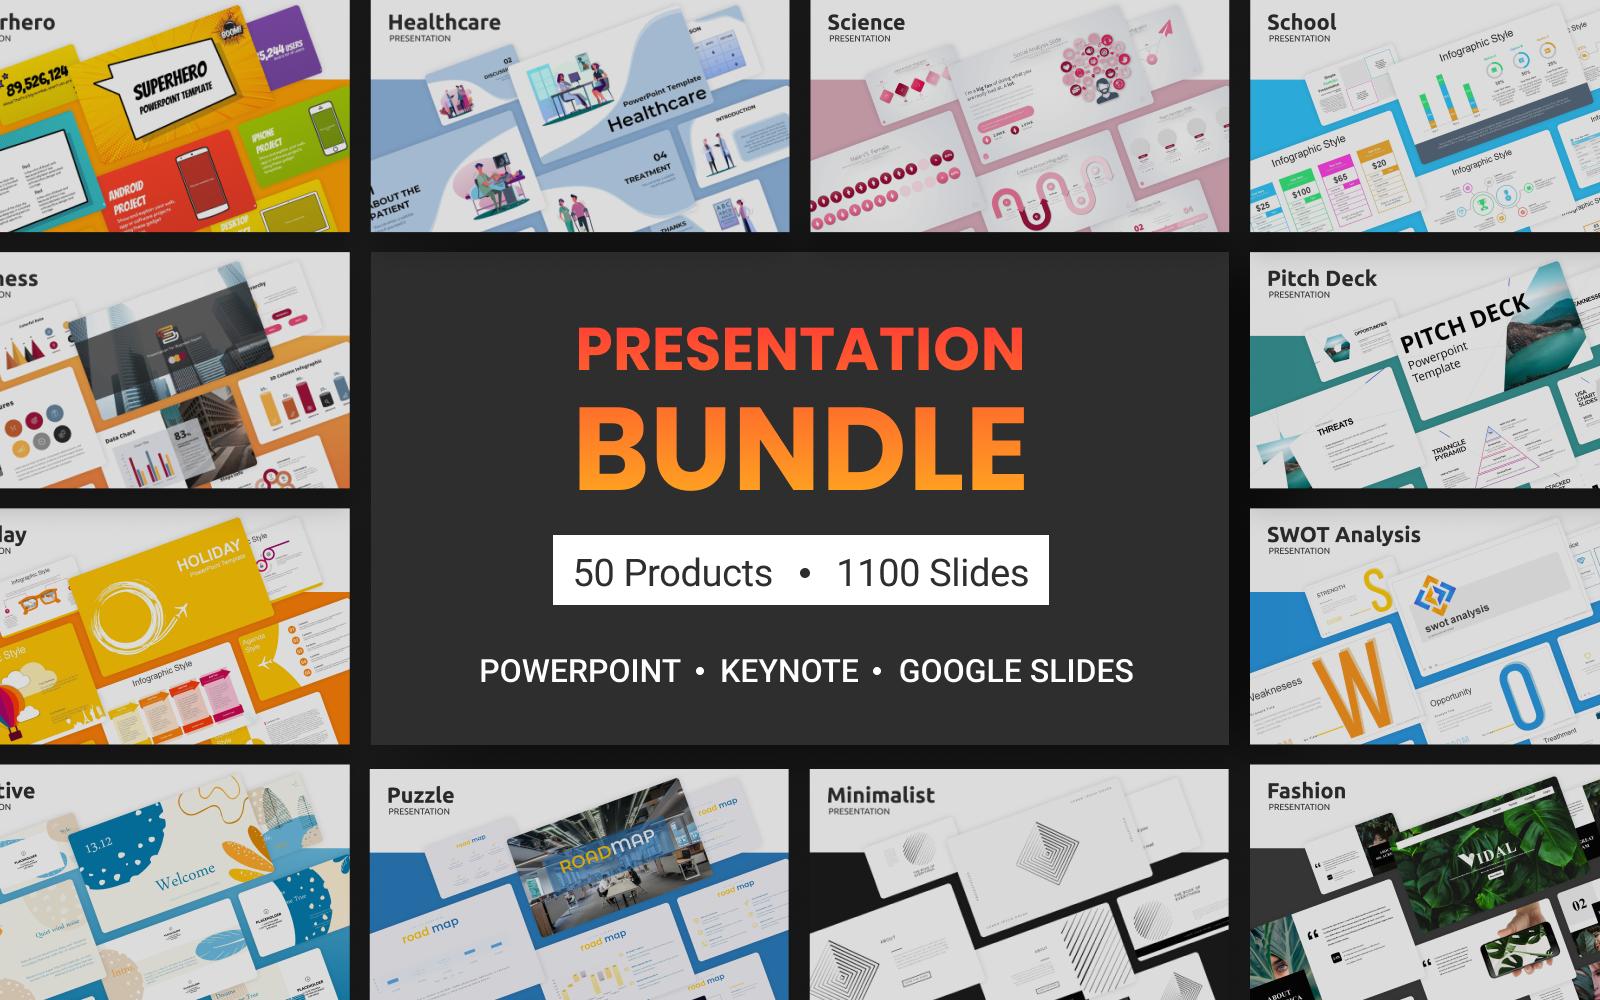 1100 Powerpoint, Keynote, Google Slides: 50 Elegant PowerPoint sablon 124522